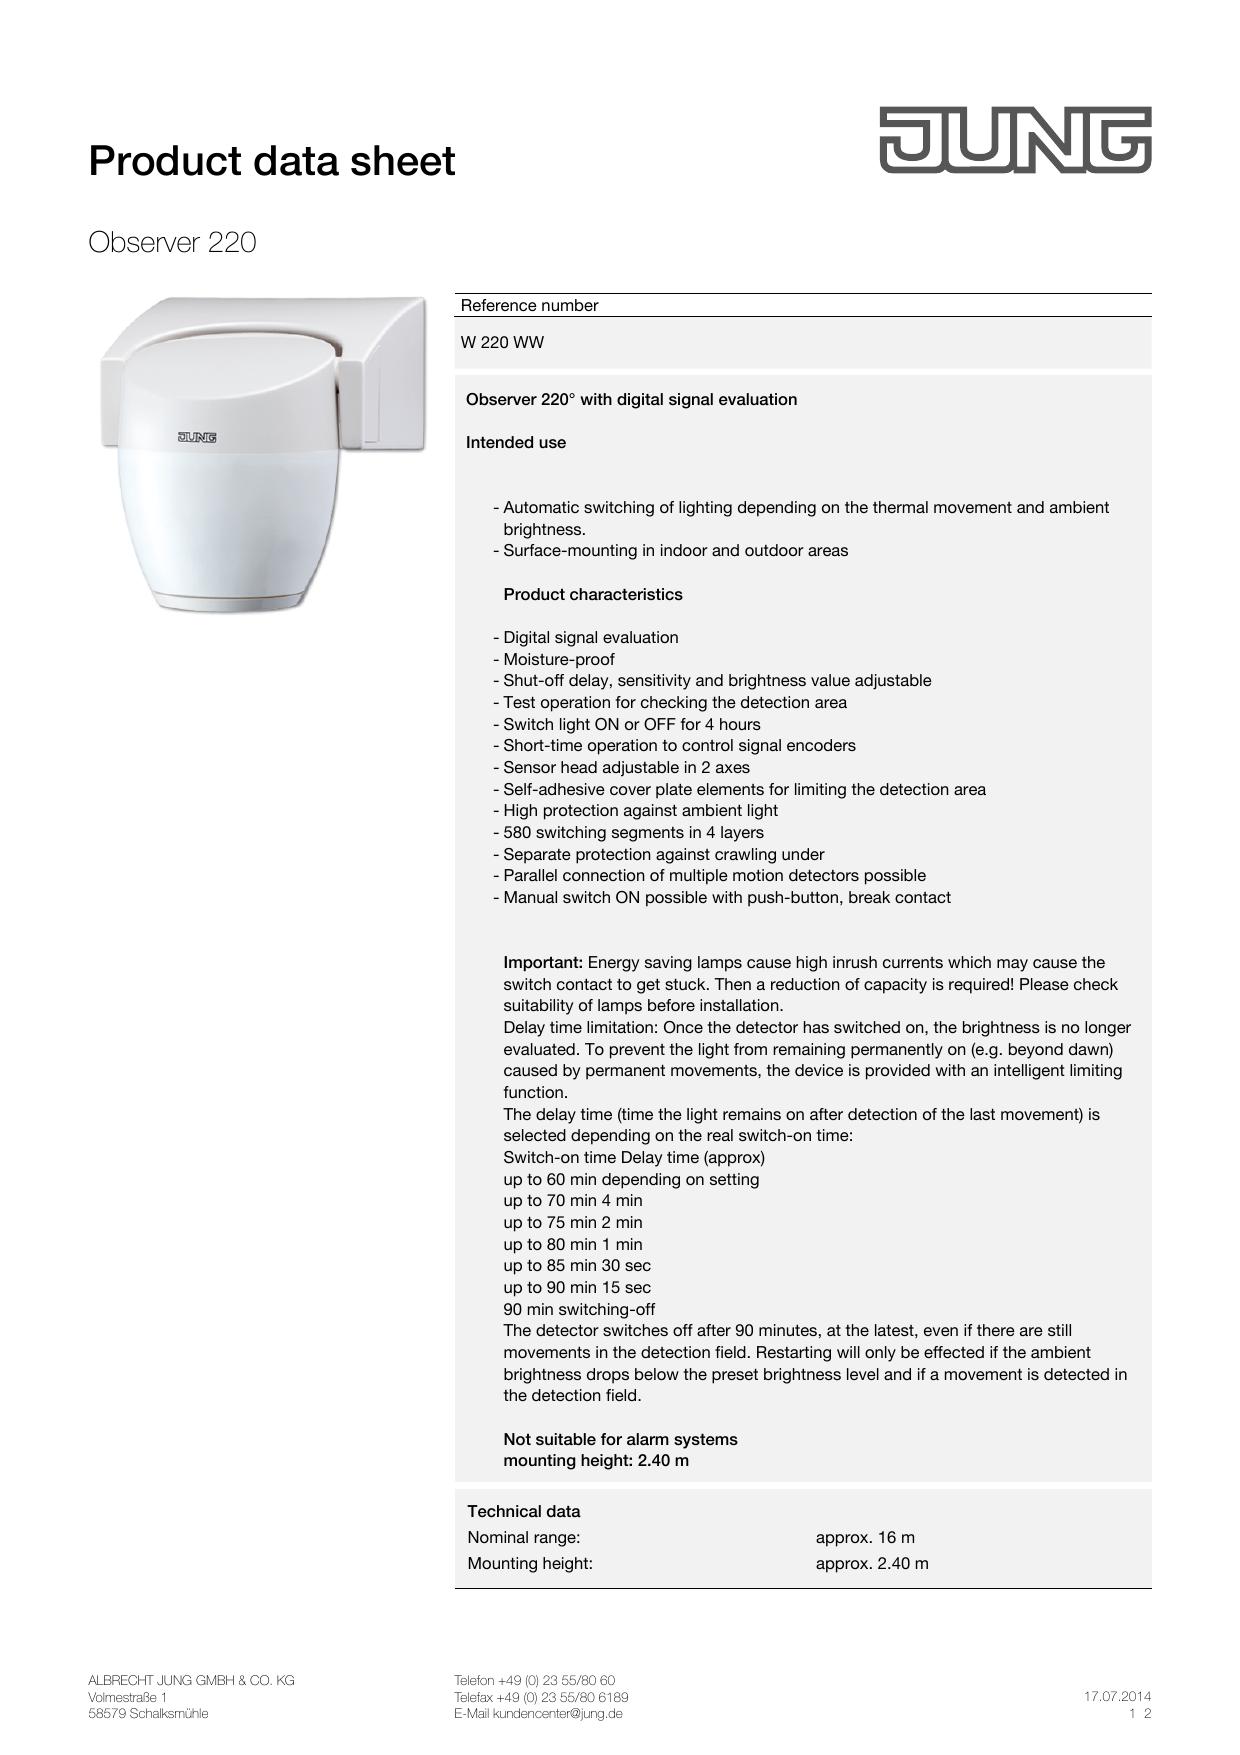 Jung Product Data Sheet Manualzz Com